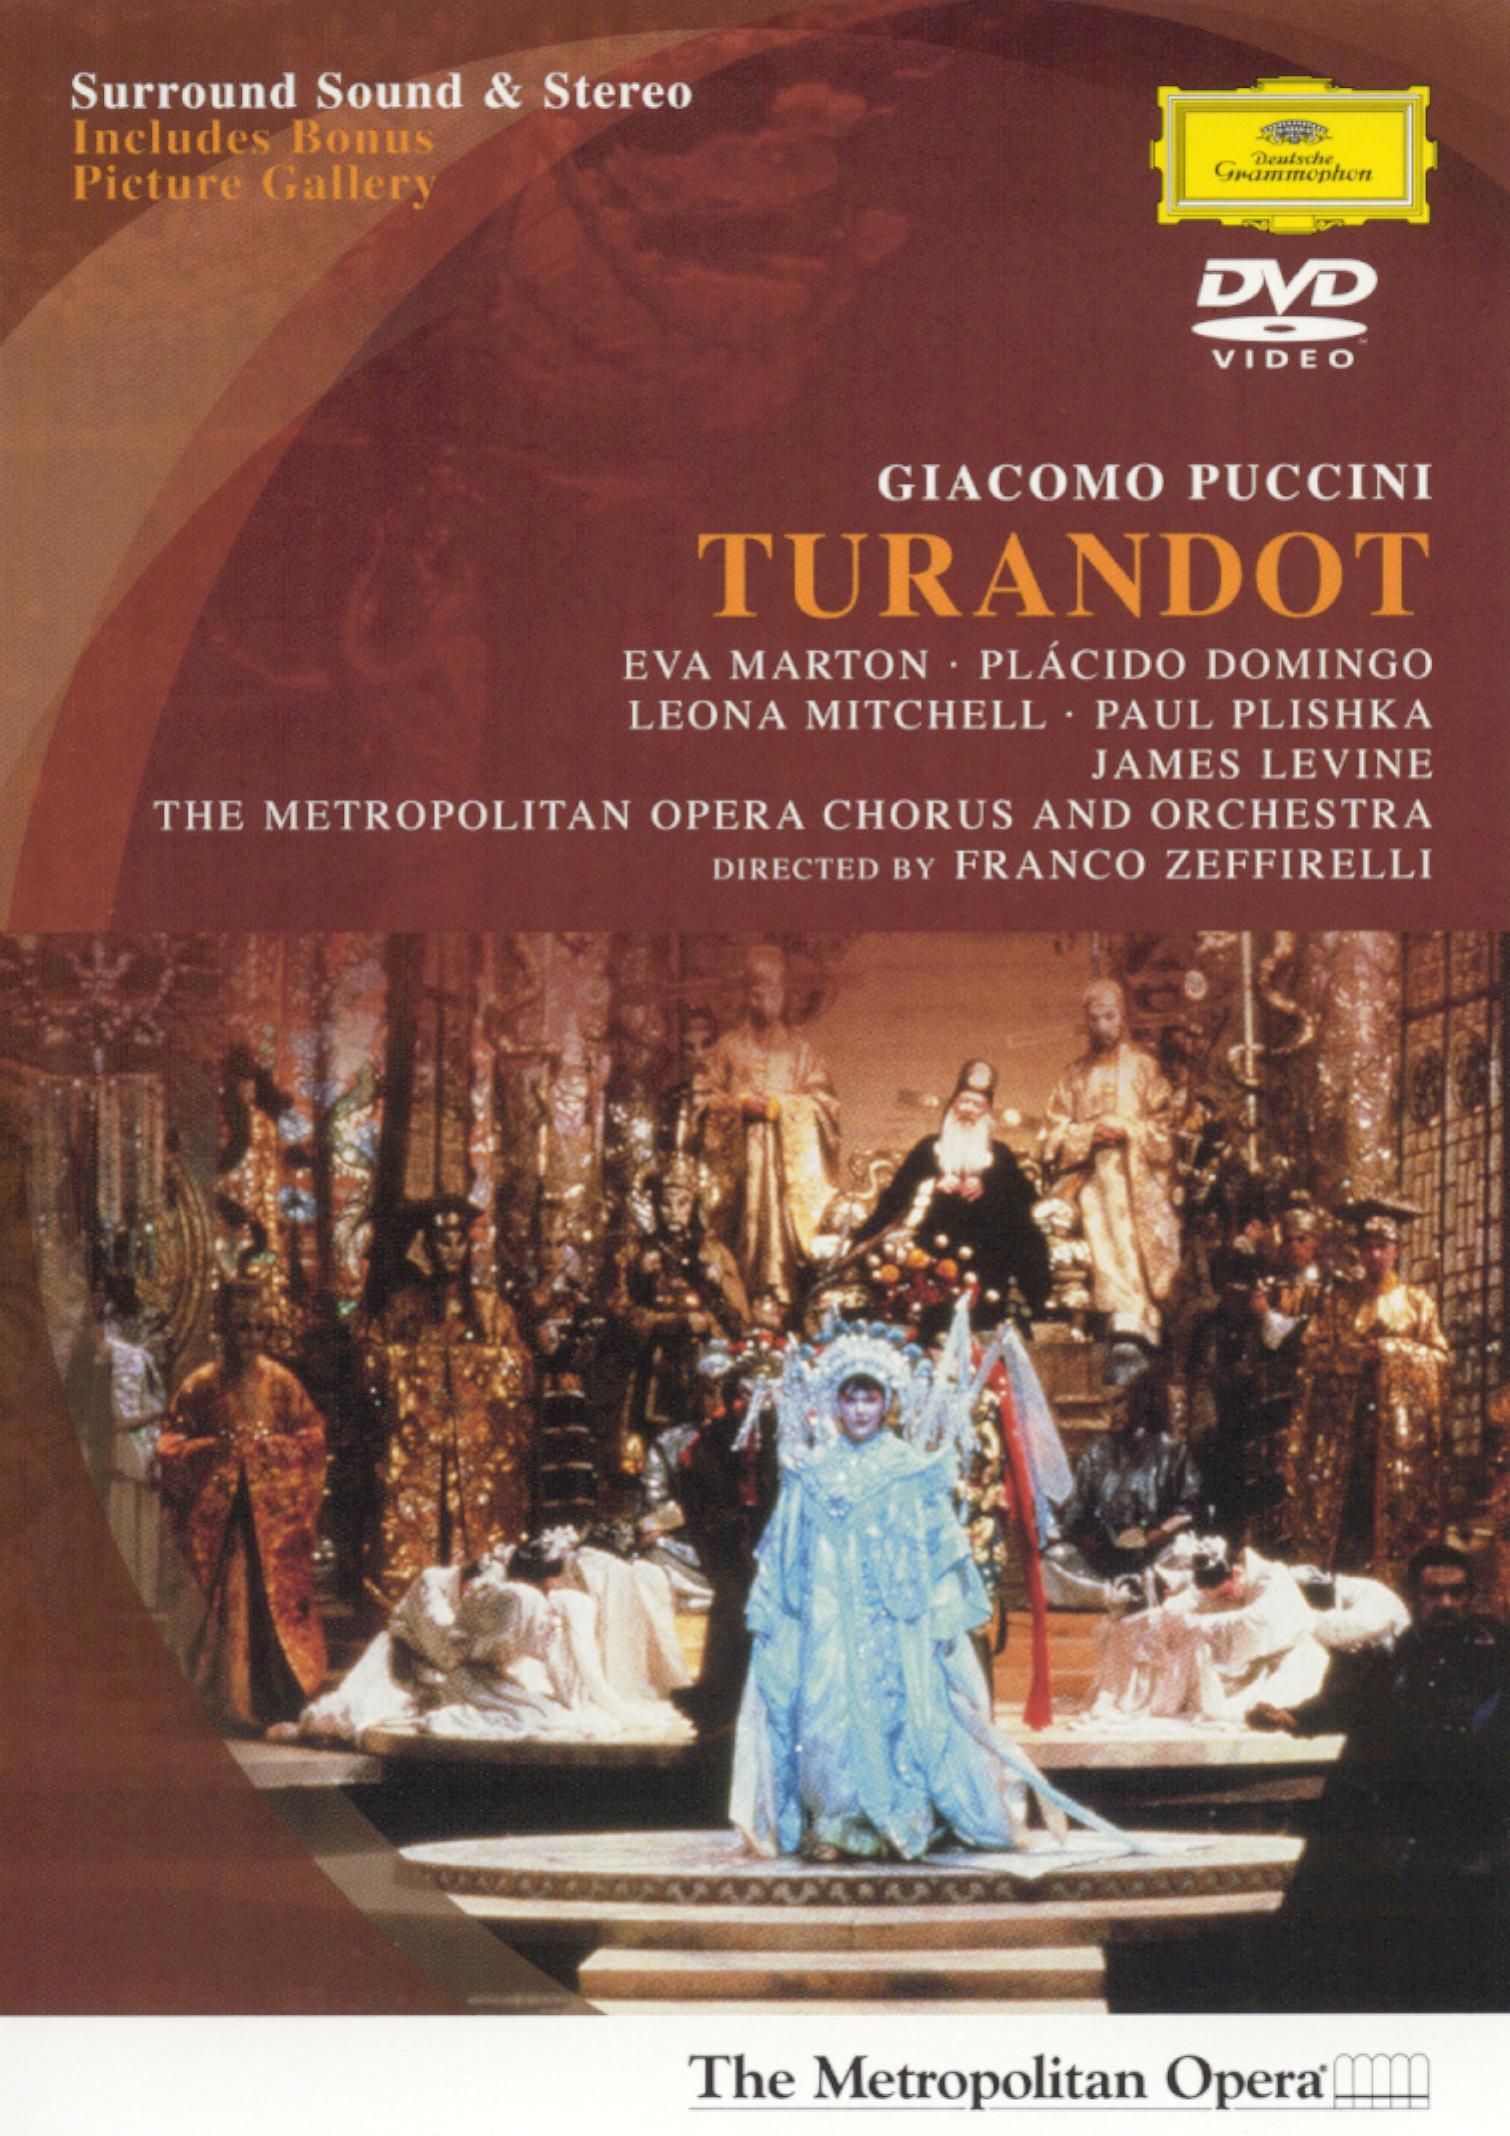 Turandot (The Metropolitan Opera)